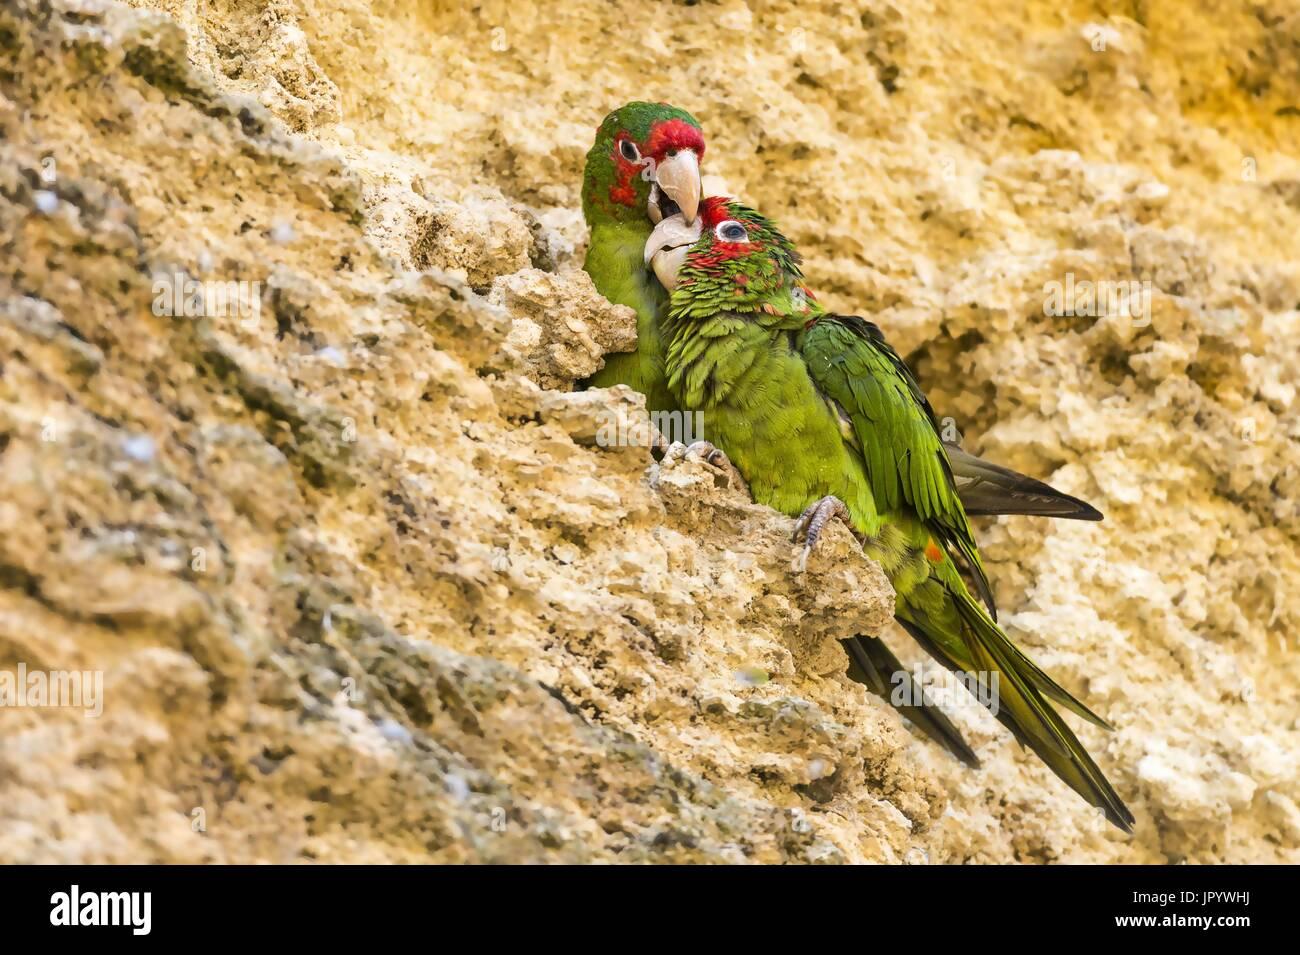 Perruche à onglets (Psittacara mitratus) sur falaise Photo Stock